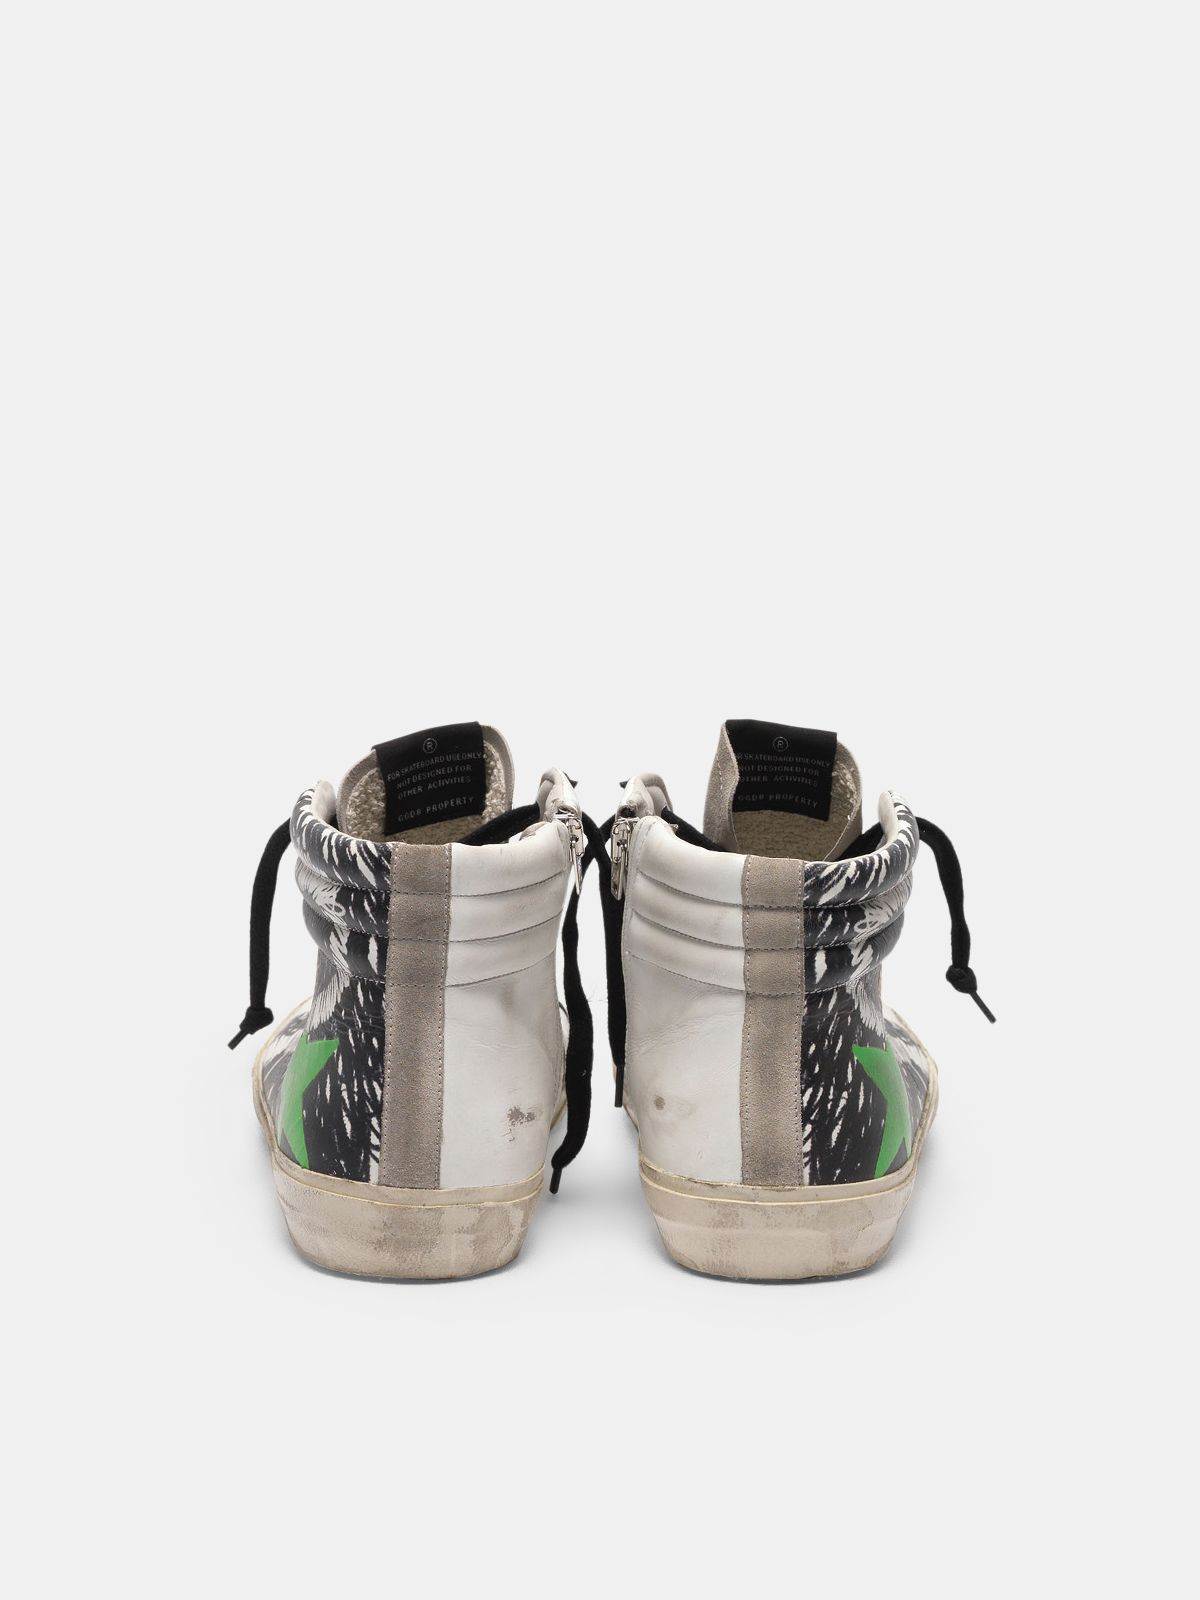 Golden Goose - Sneakers Slide in pelle e suede con stampa grafica in